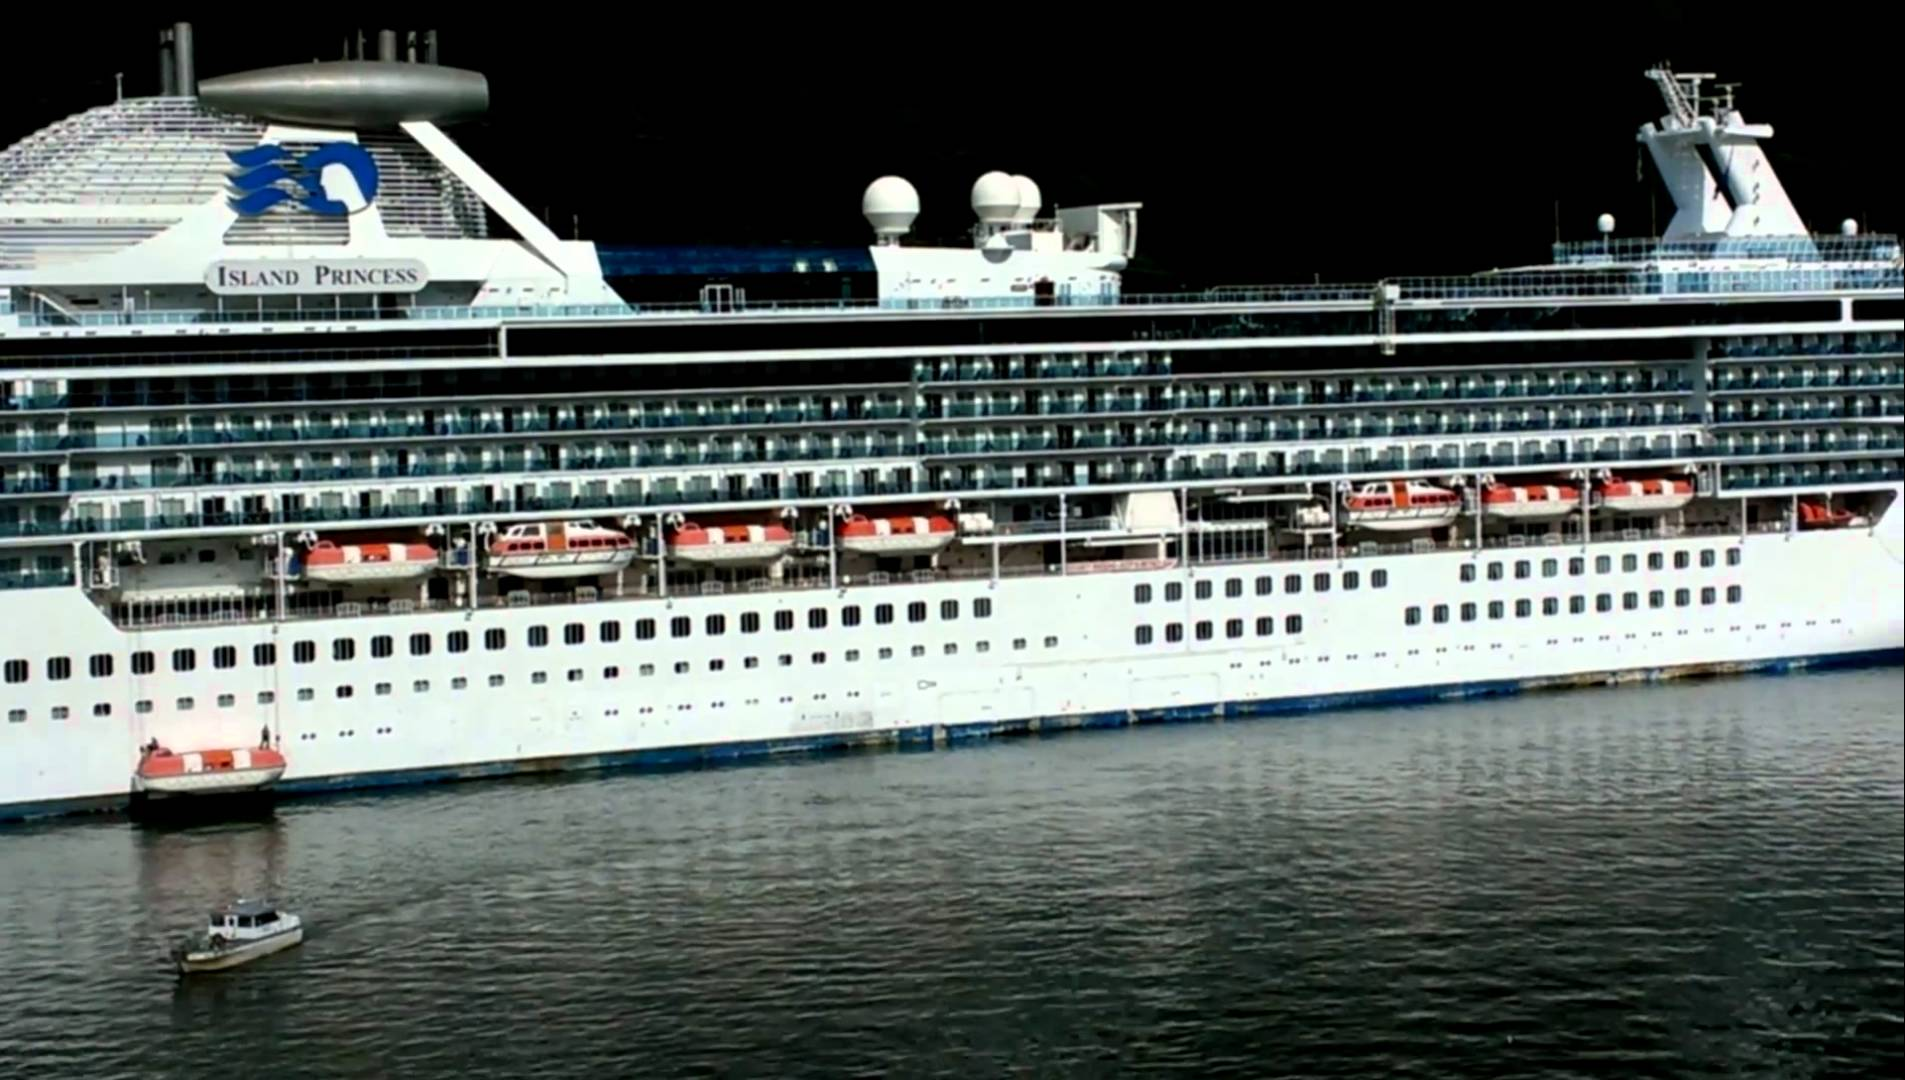 Croaziera 2018/2019 - Transcanal / Canalul Panama (Fort Lauderdale) - Princess Cruises - Island Princess - 10 nopti